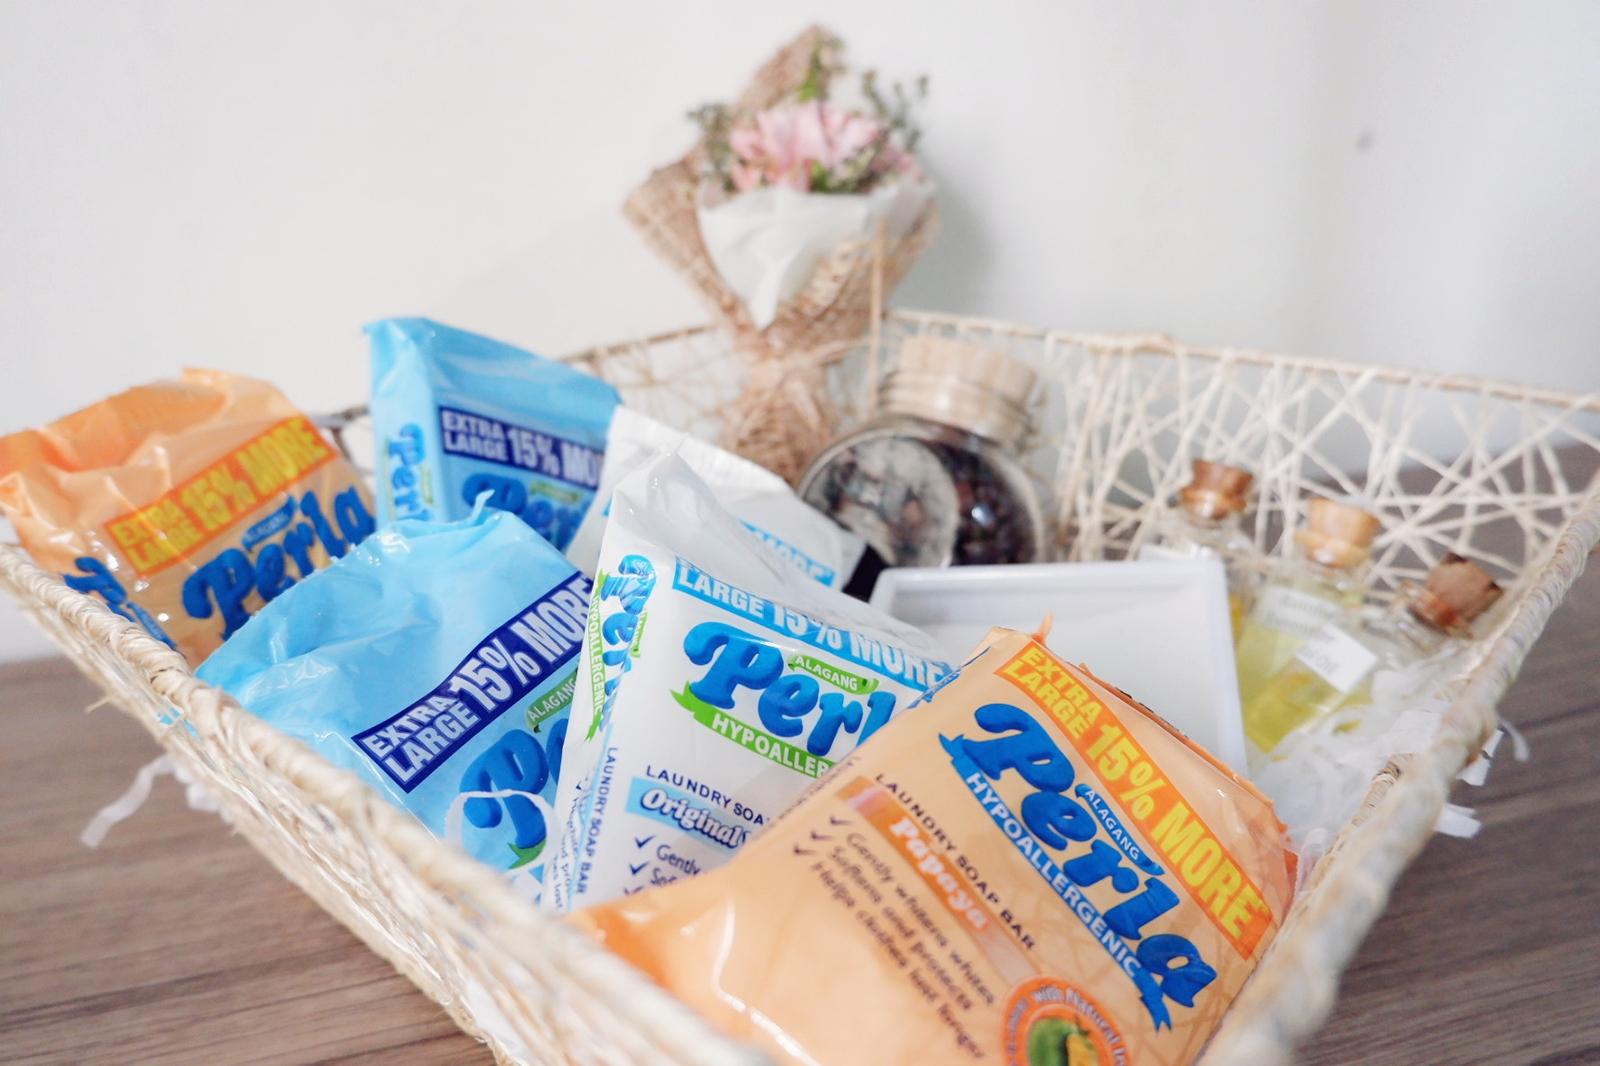 Perla Hypoallergenic Laundry Soap Bar